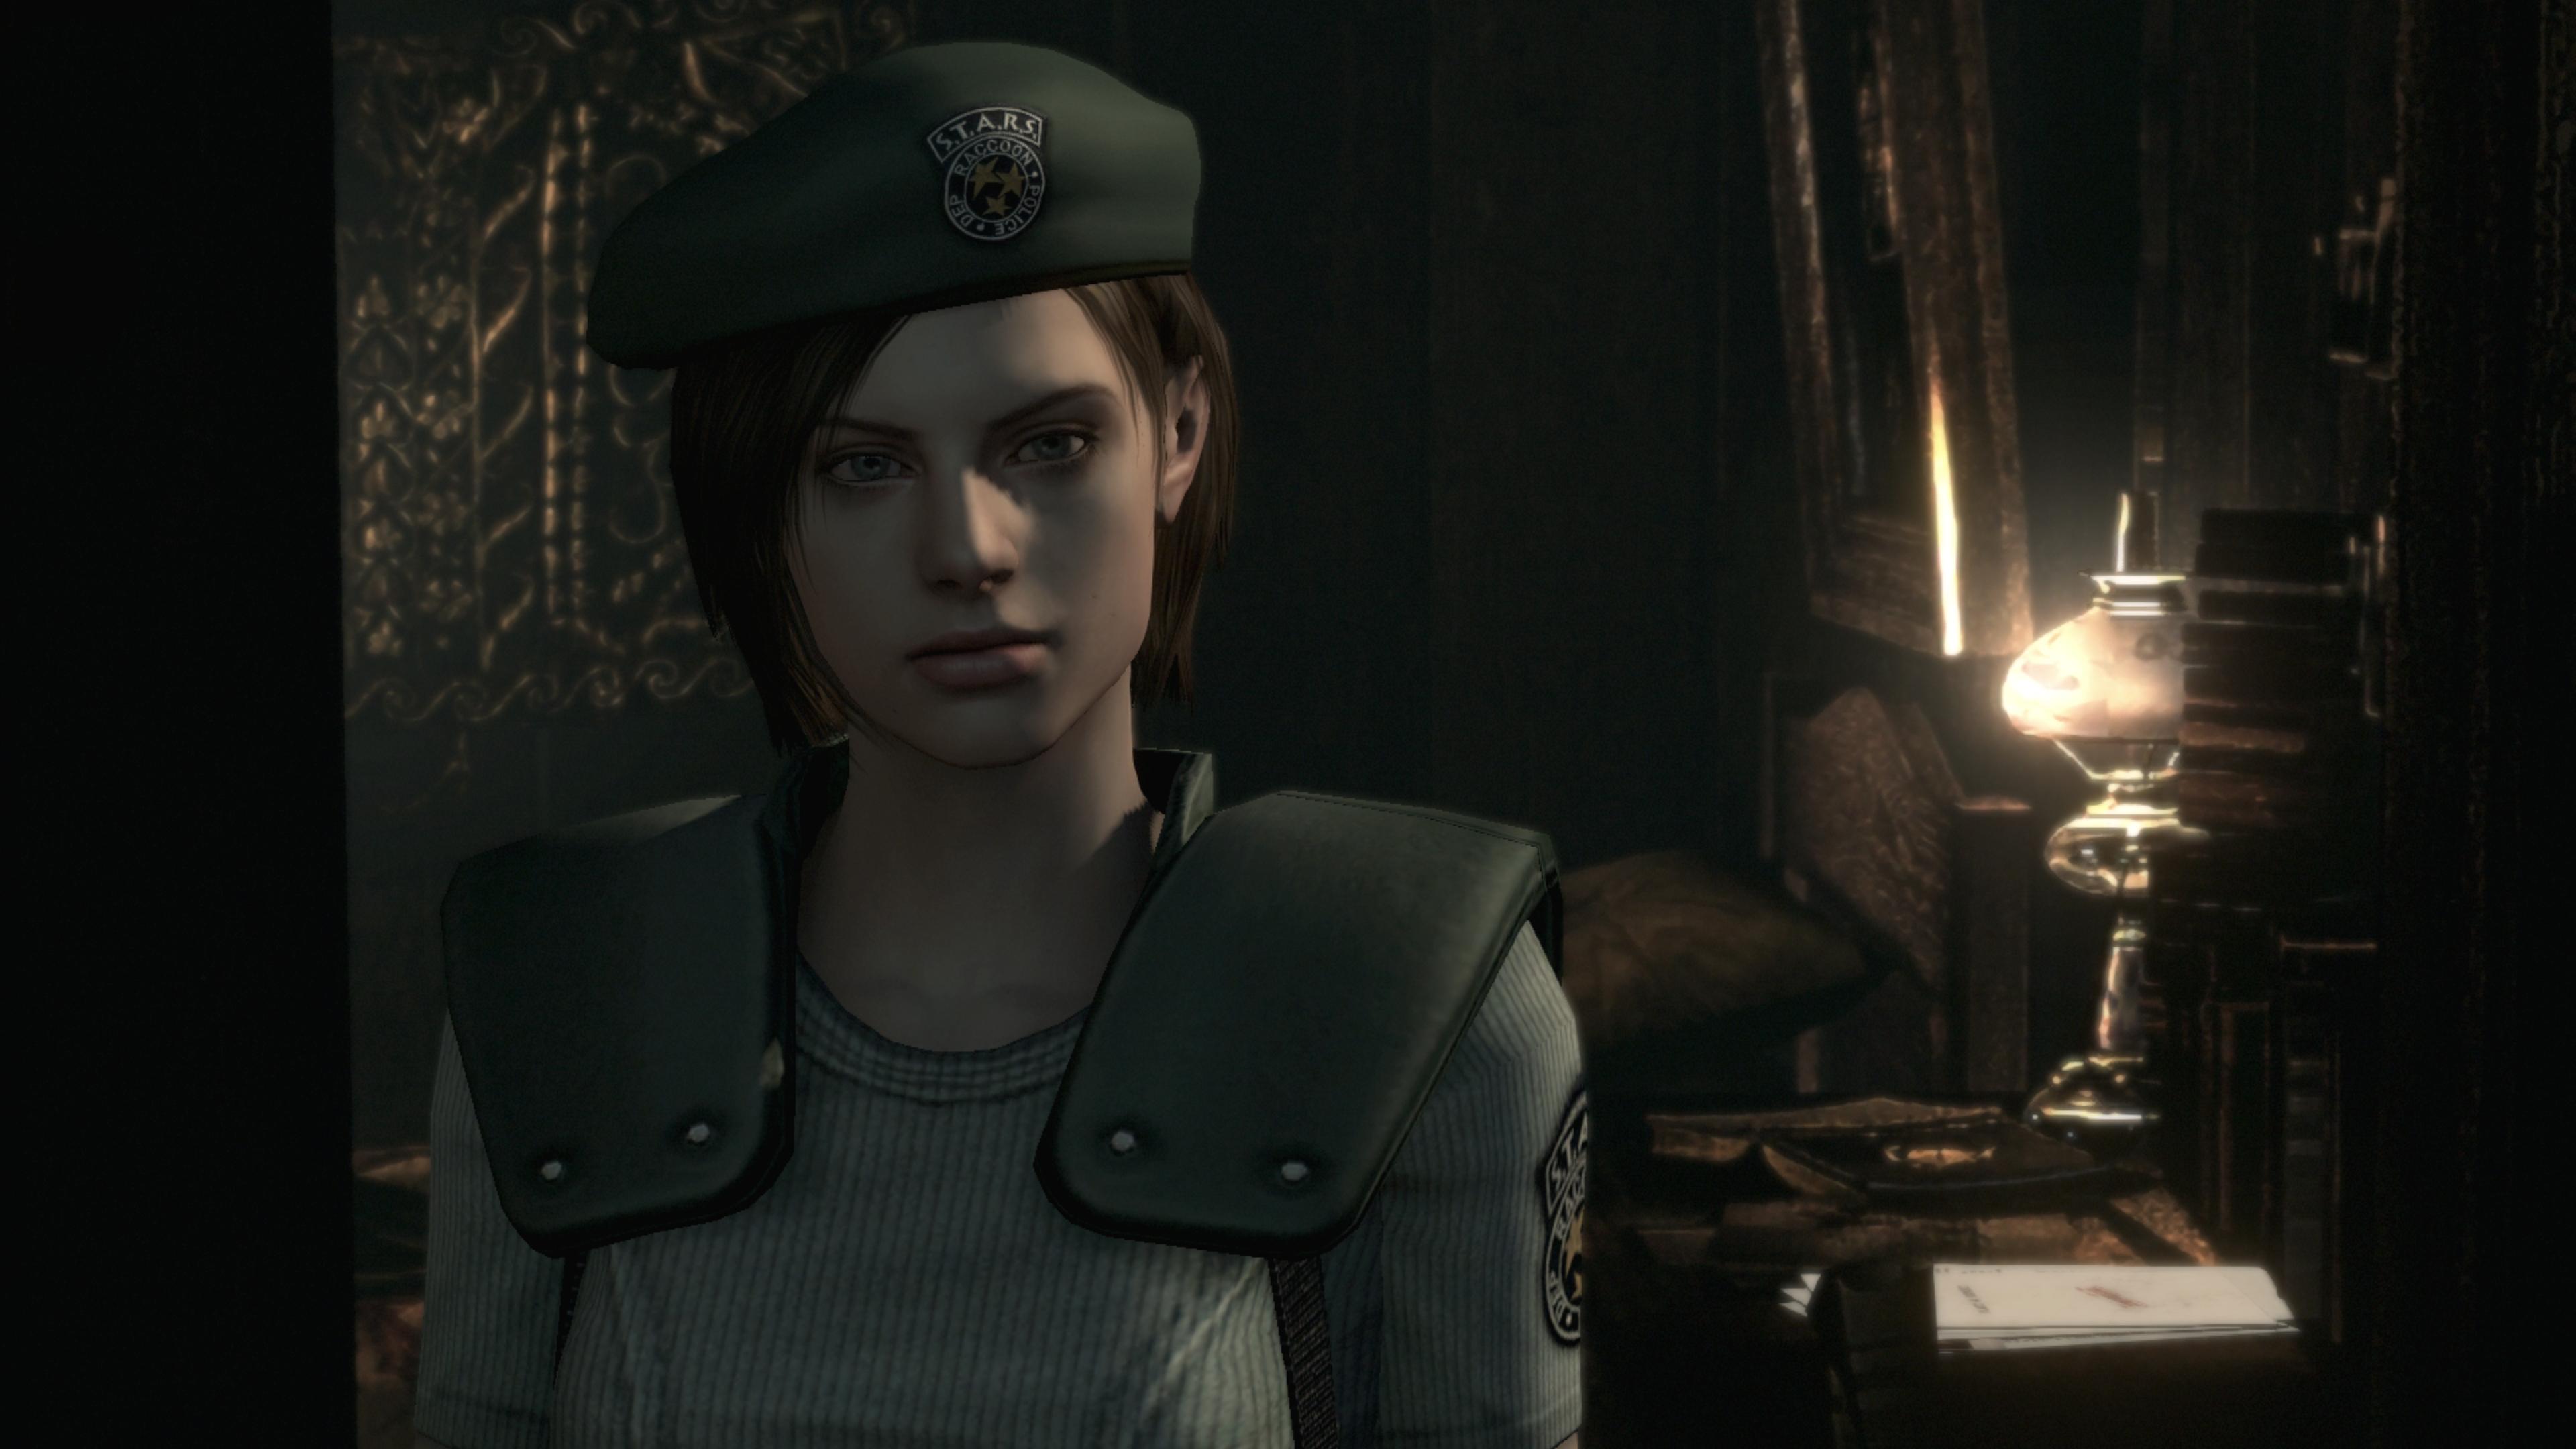 Resident Evil Jill Valentine 1 4k Ultra Hd Wallpaper Background